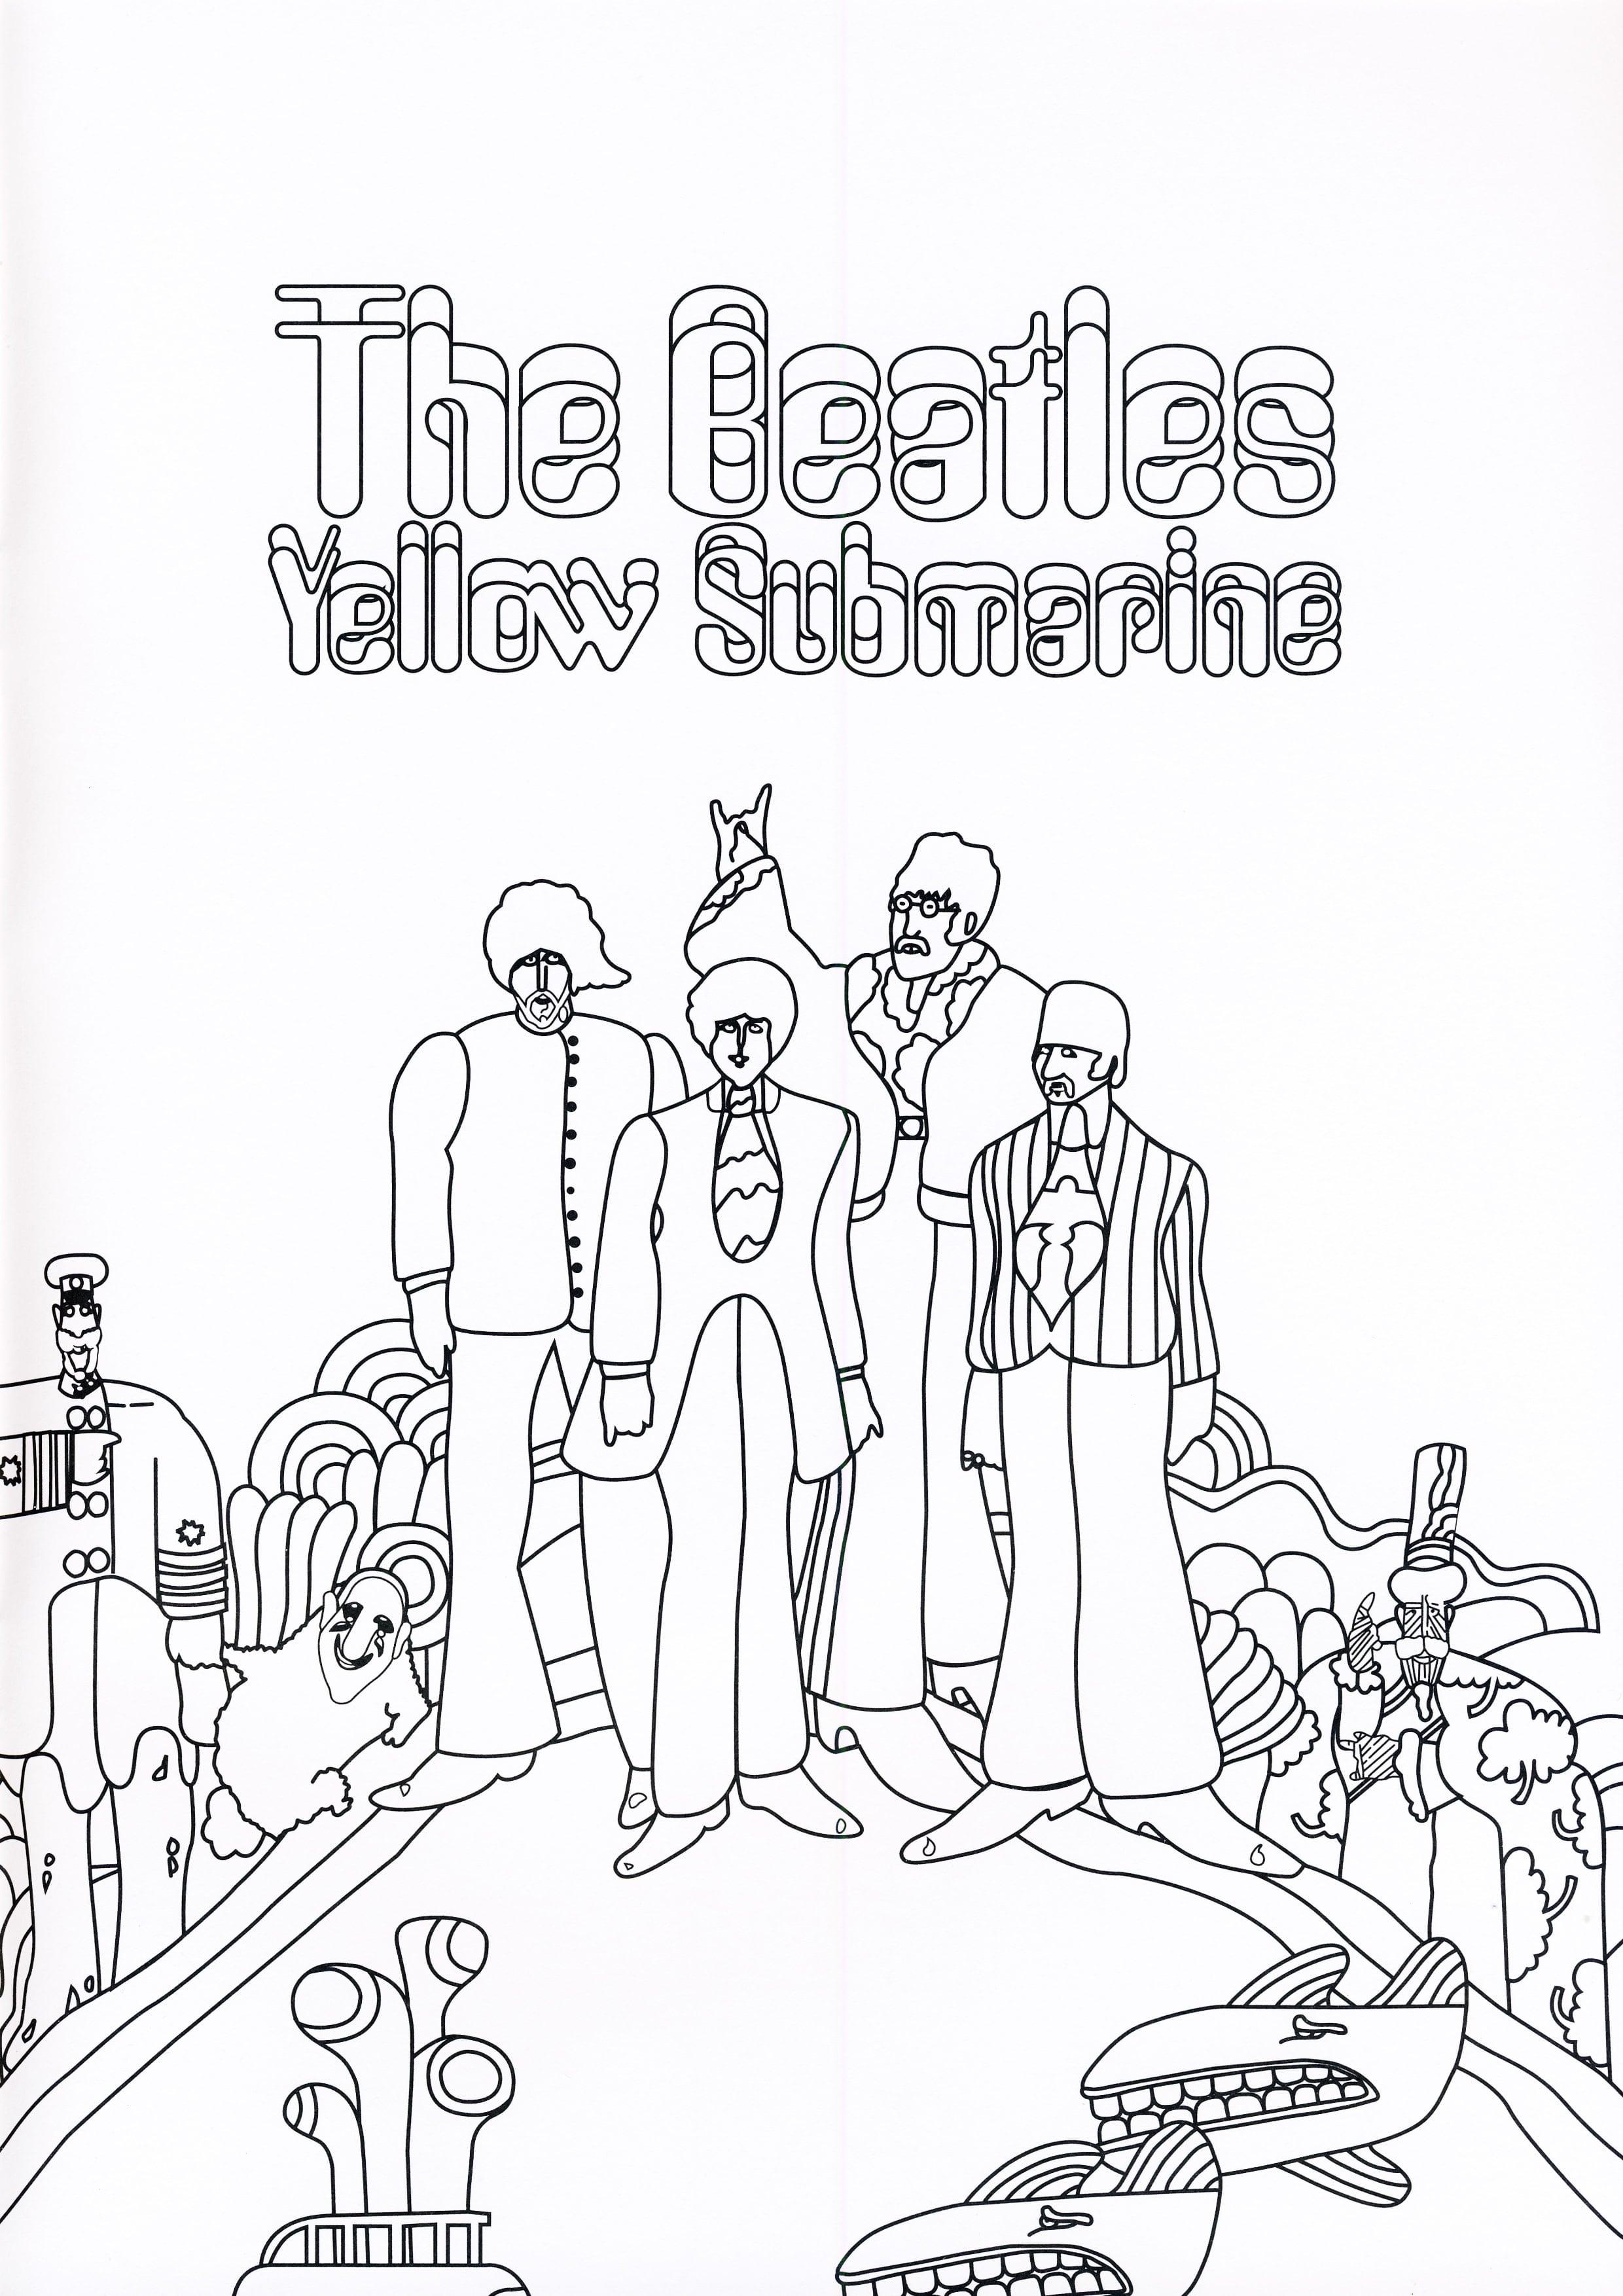 Wunderbar Beatles Malbuch Galerie - Framing Malvorlagen ...